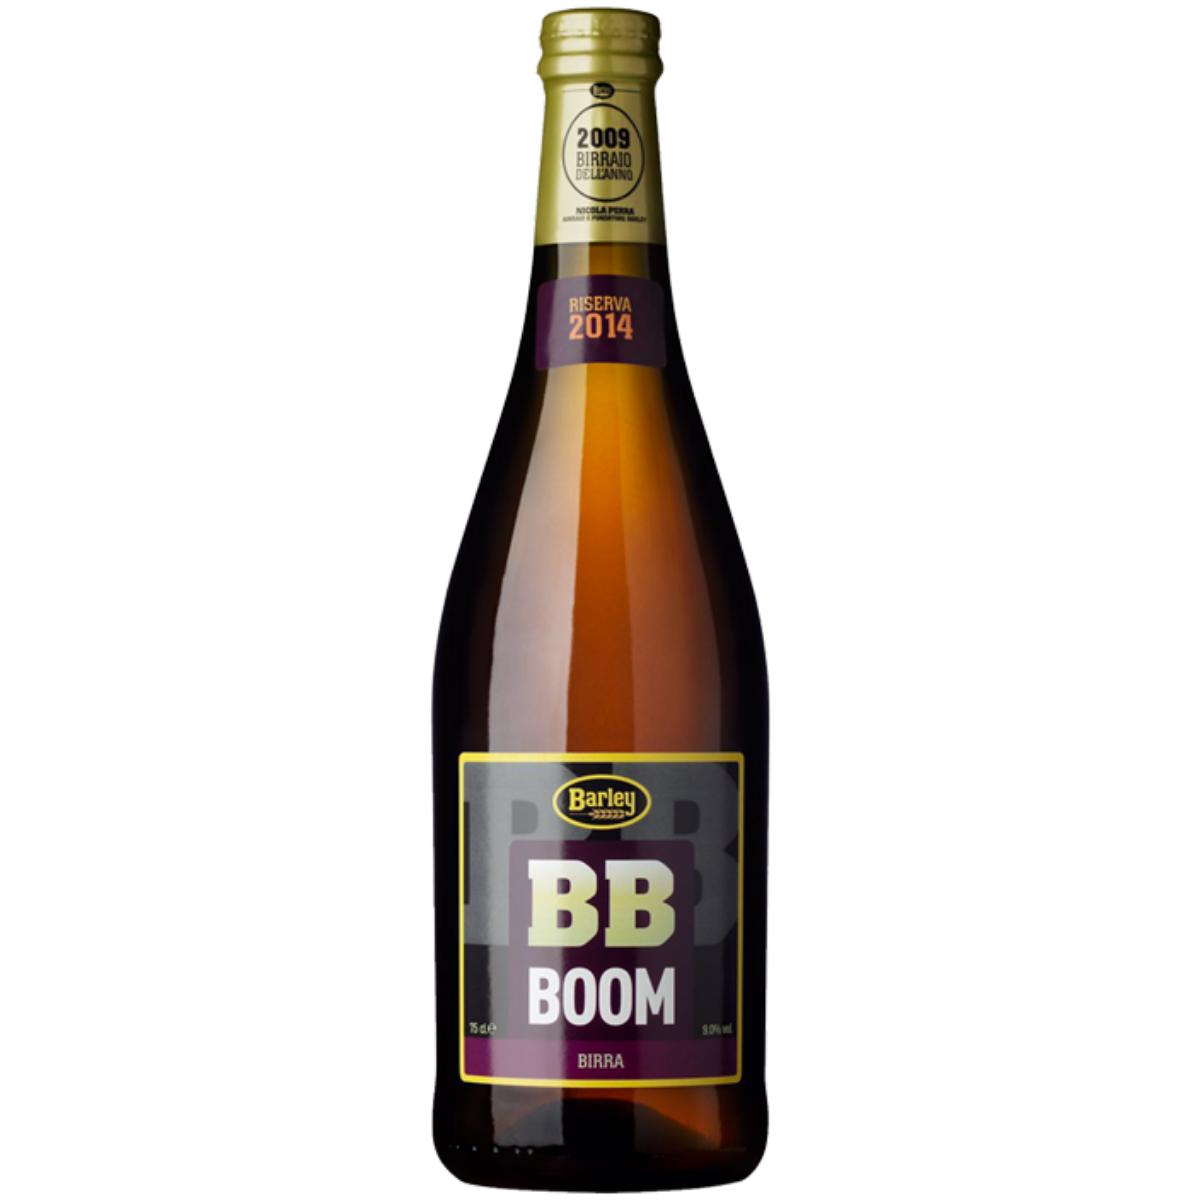 Birra artigianale BB BOOM Barley